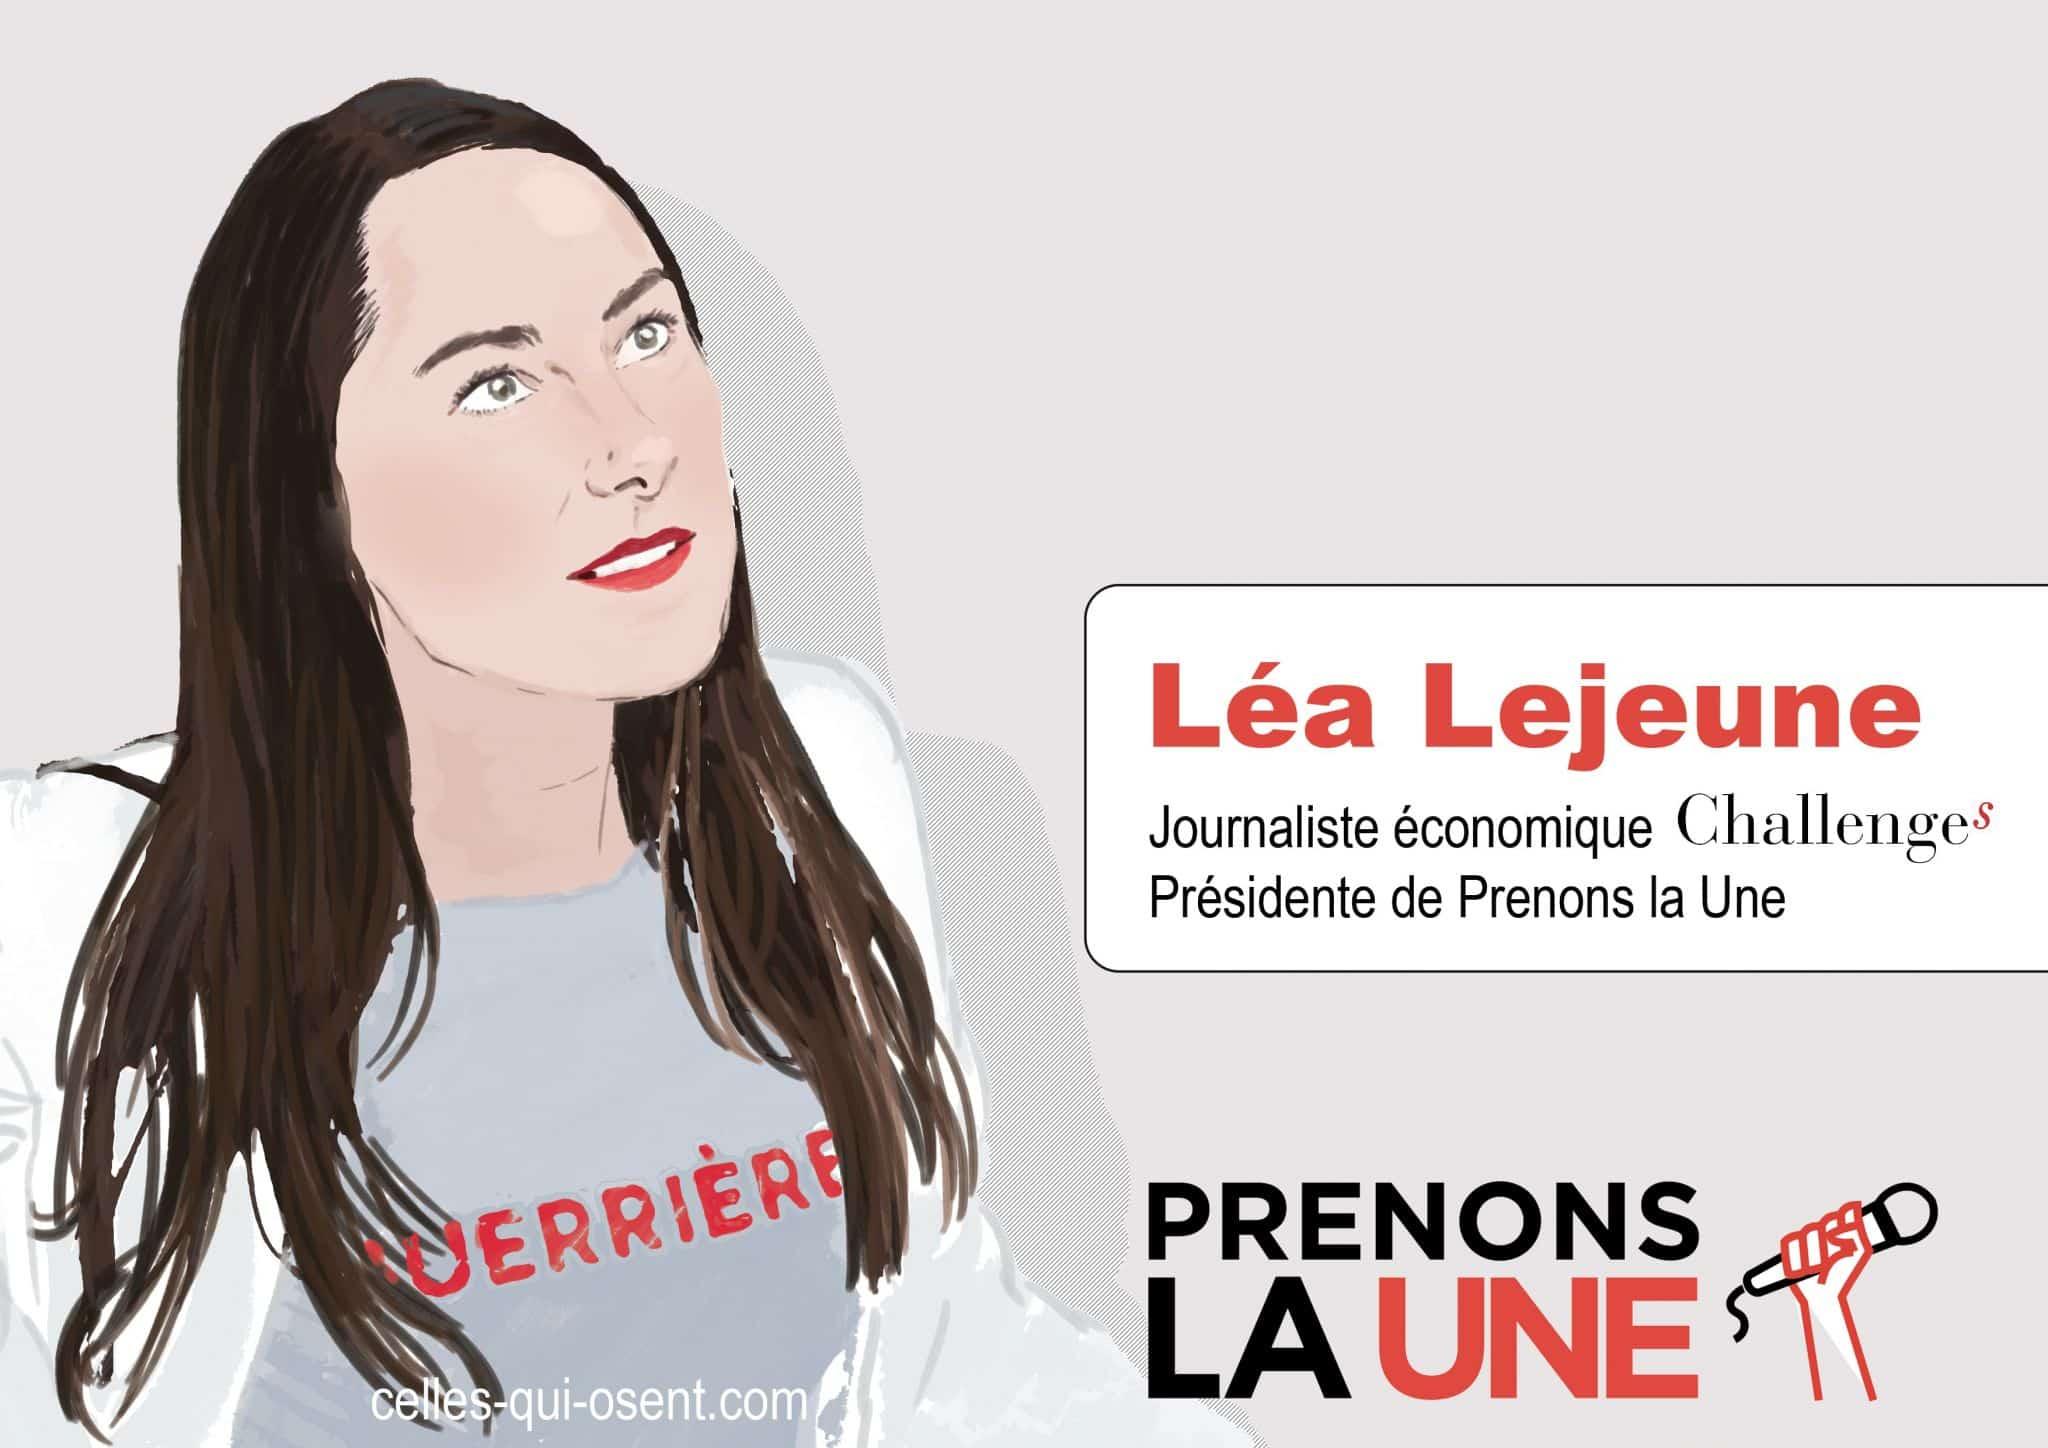 lea-lejeune-feminisme-washing-celles-qui-osent